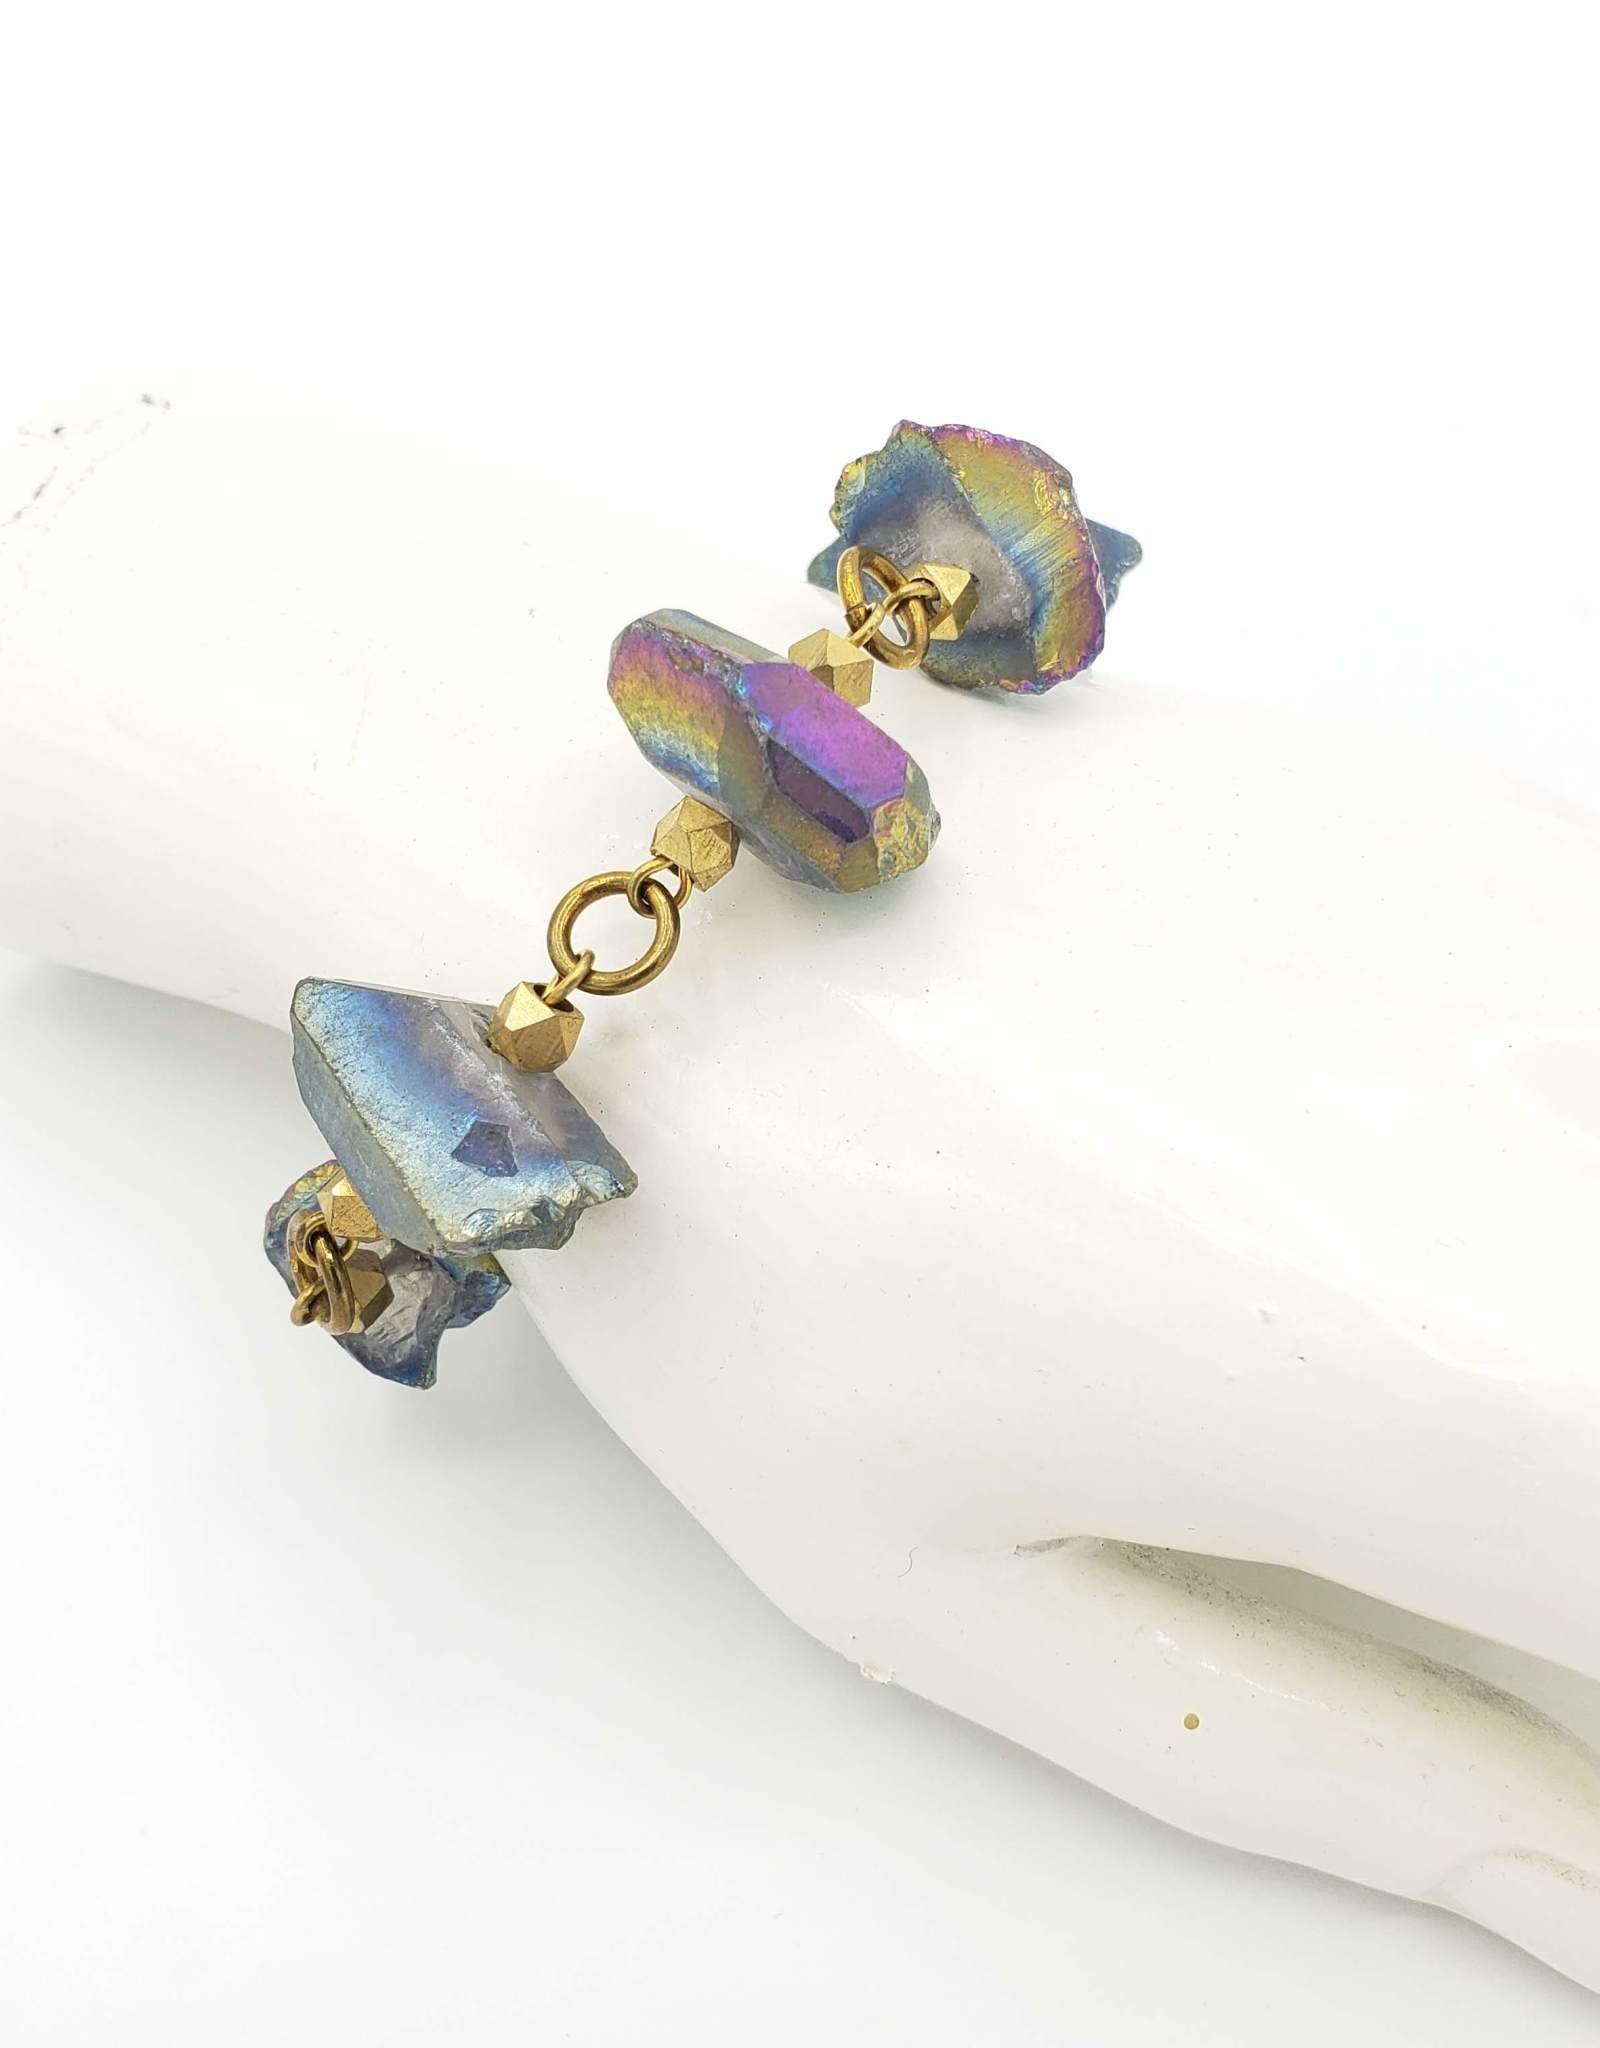 Flea Market Girl Blue Quartz Brass Chain Bracelet